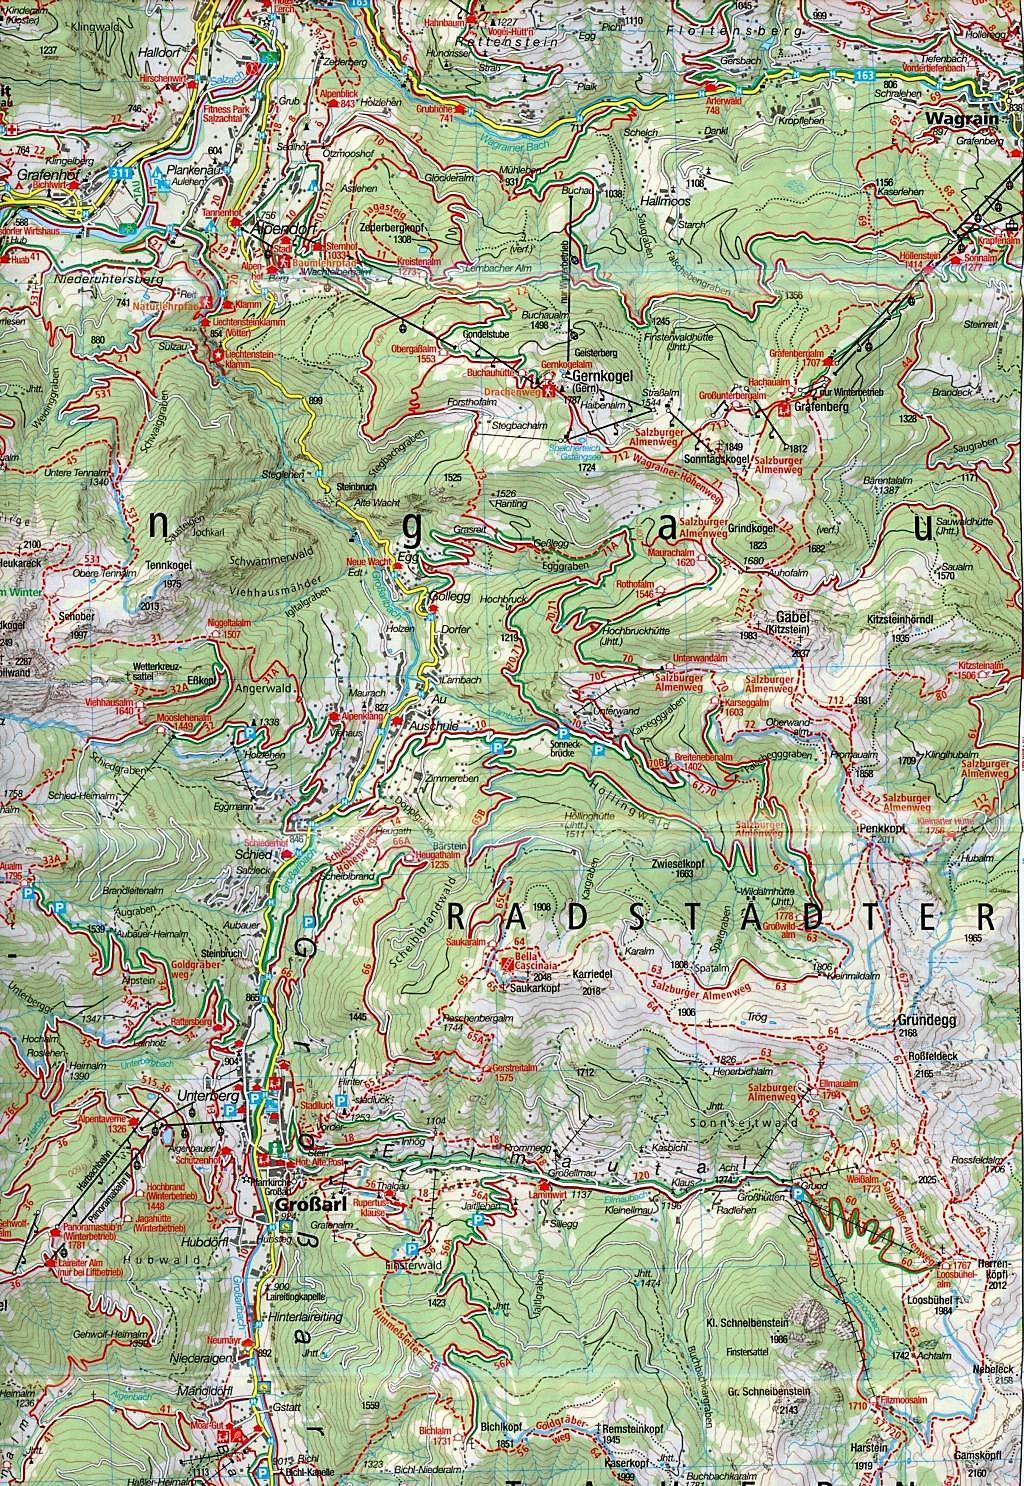 Hohe Tauern Karte.Kompass Karte Gasteinertal Goldberggruppe Nationalpark Hohe Tauern